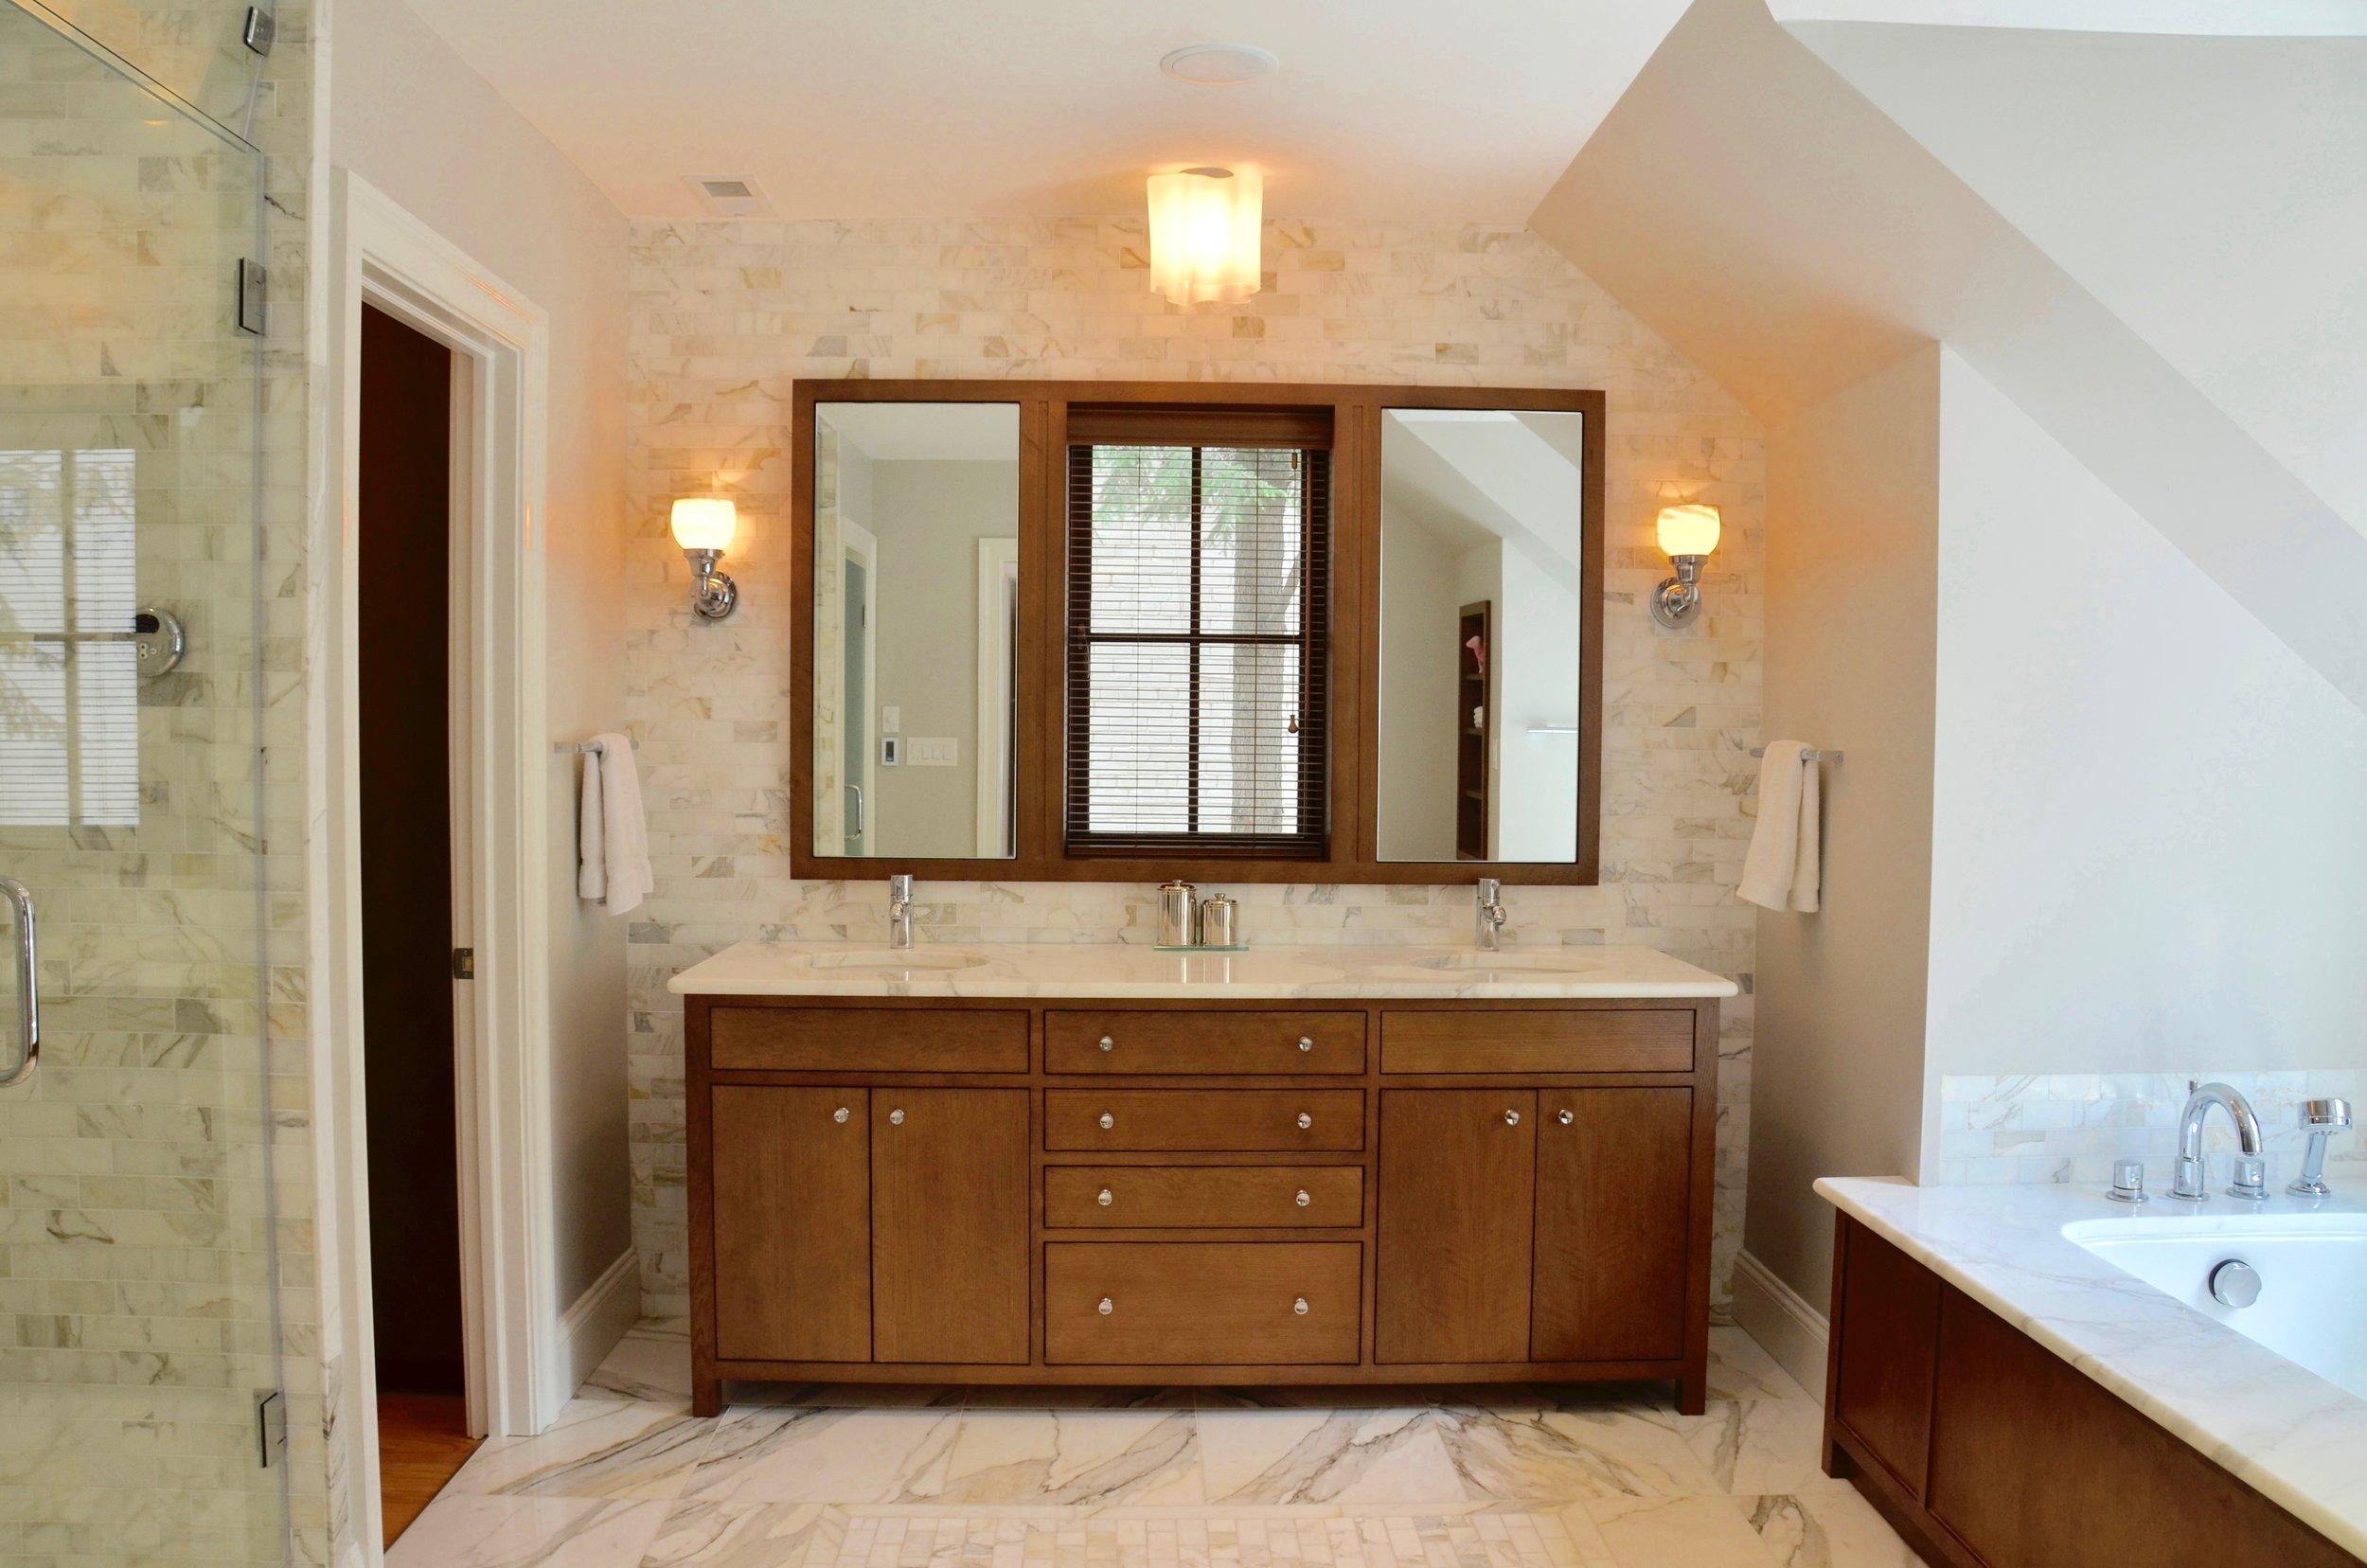 Custom vanity, tub surround,recessed mirrored medicine cabinets and new window.